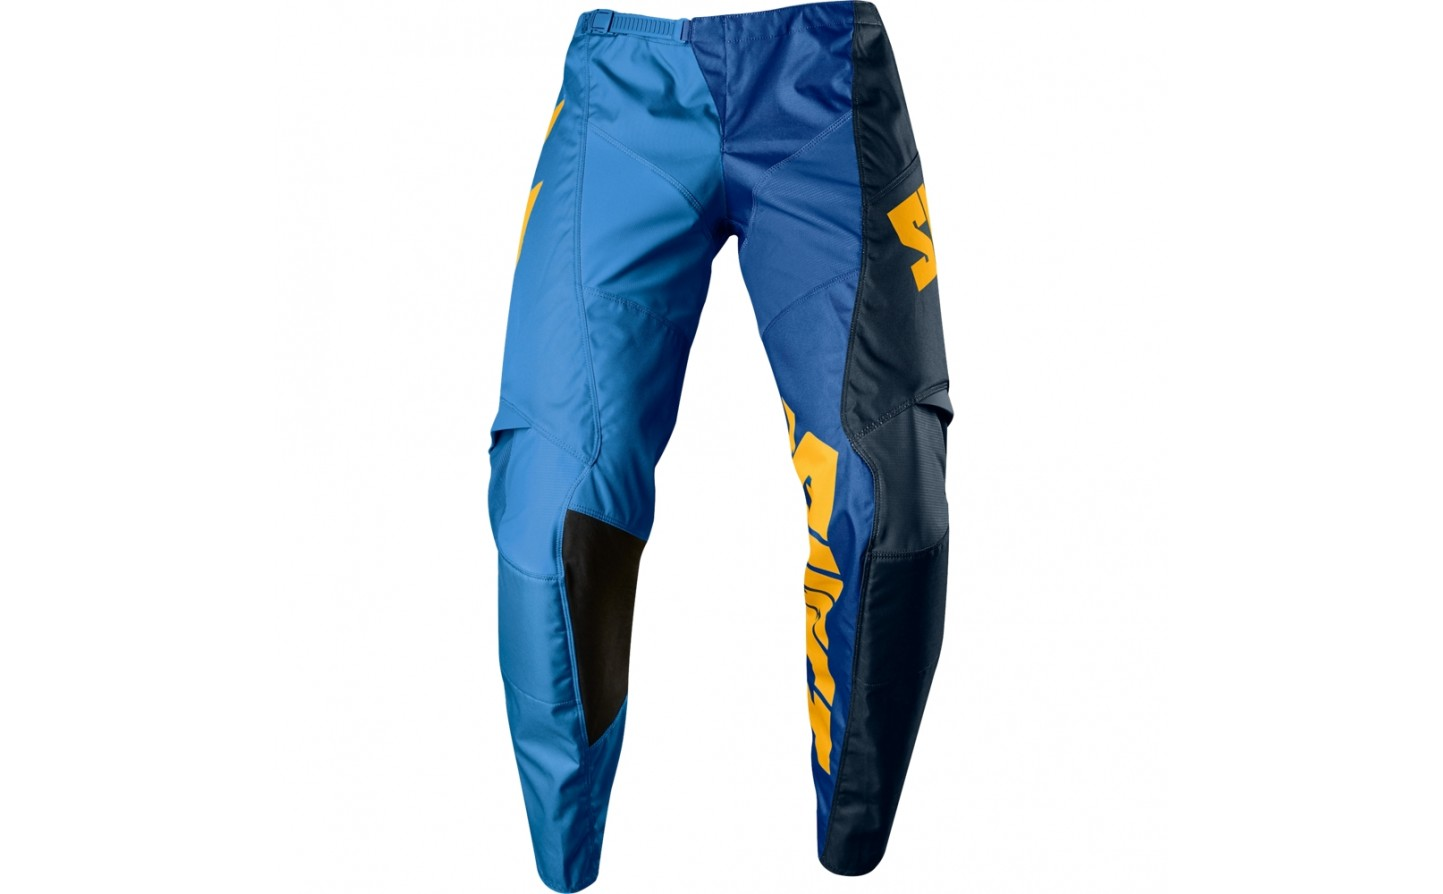 pantalon shift label whit3 tarmac azul talle 36